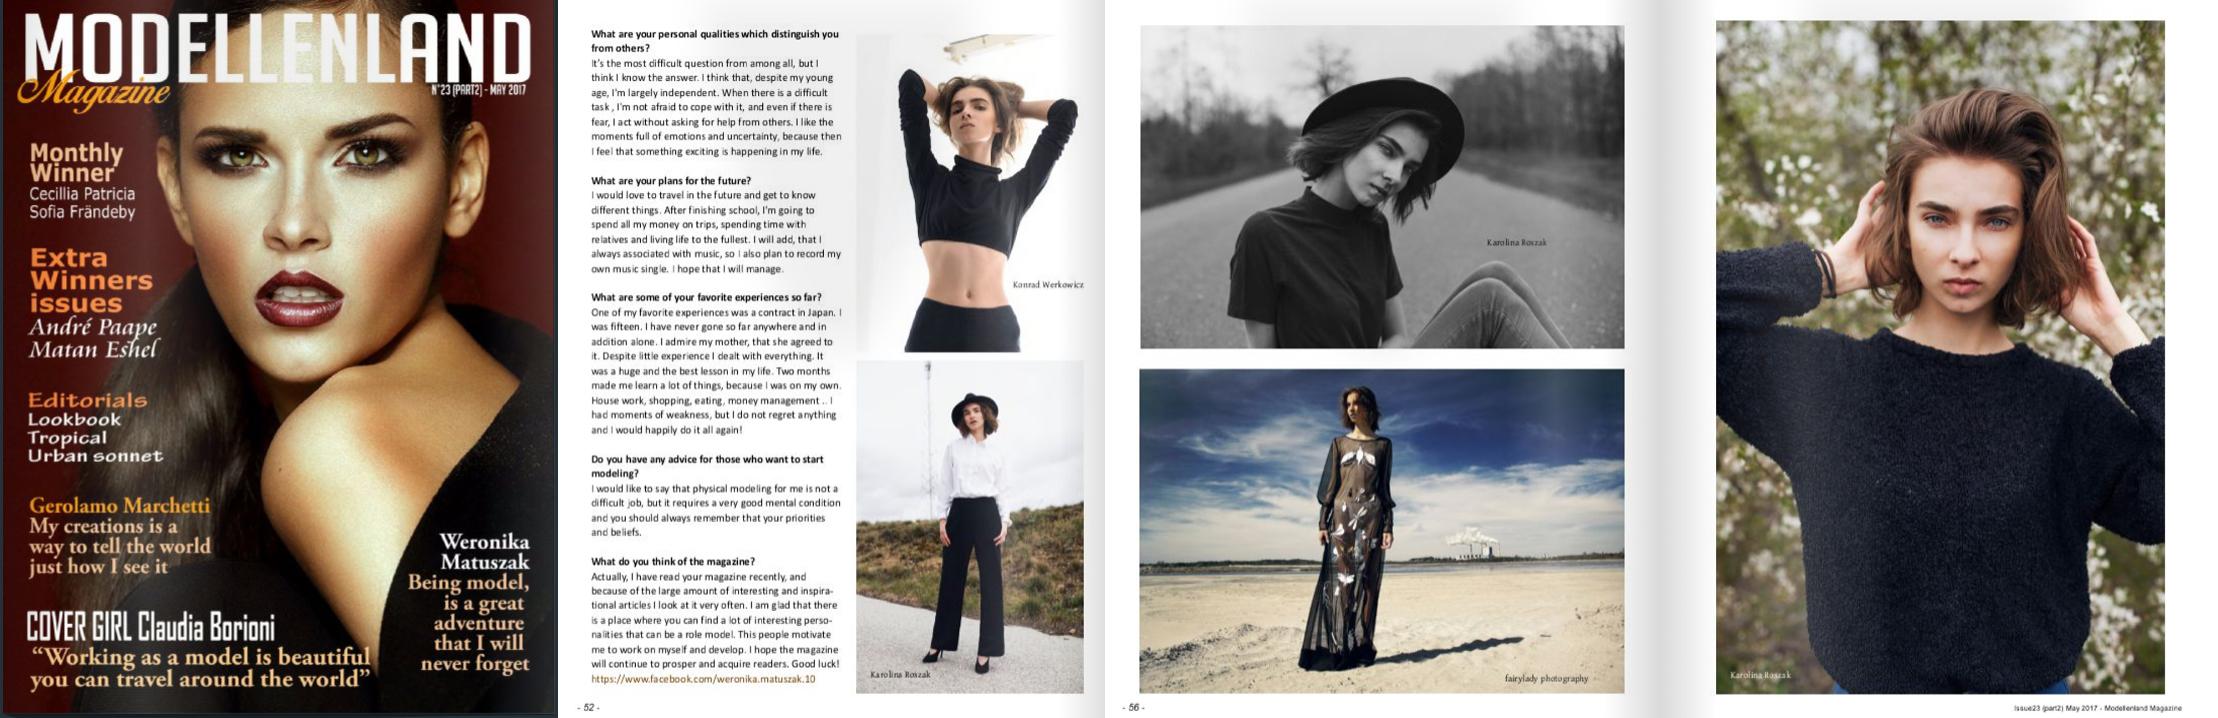 Modellen land magazine - maj 2017